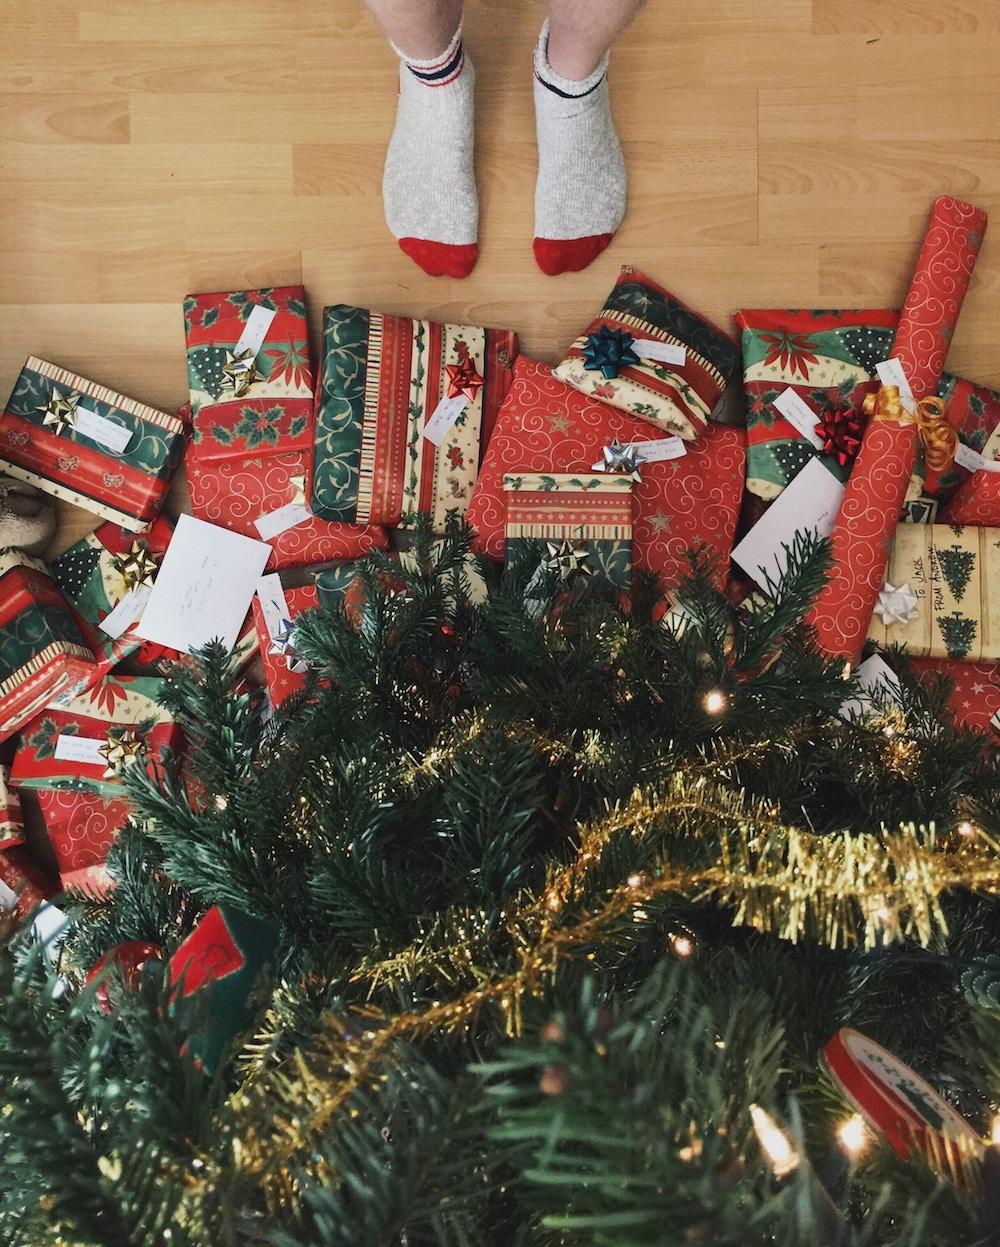 santa's grotto presents